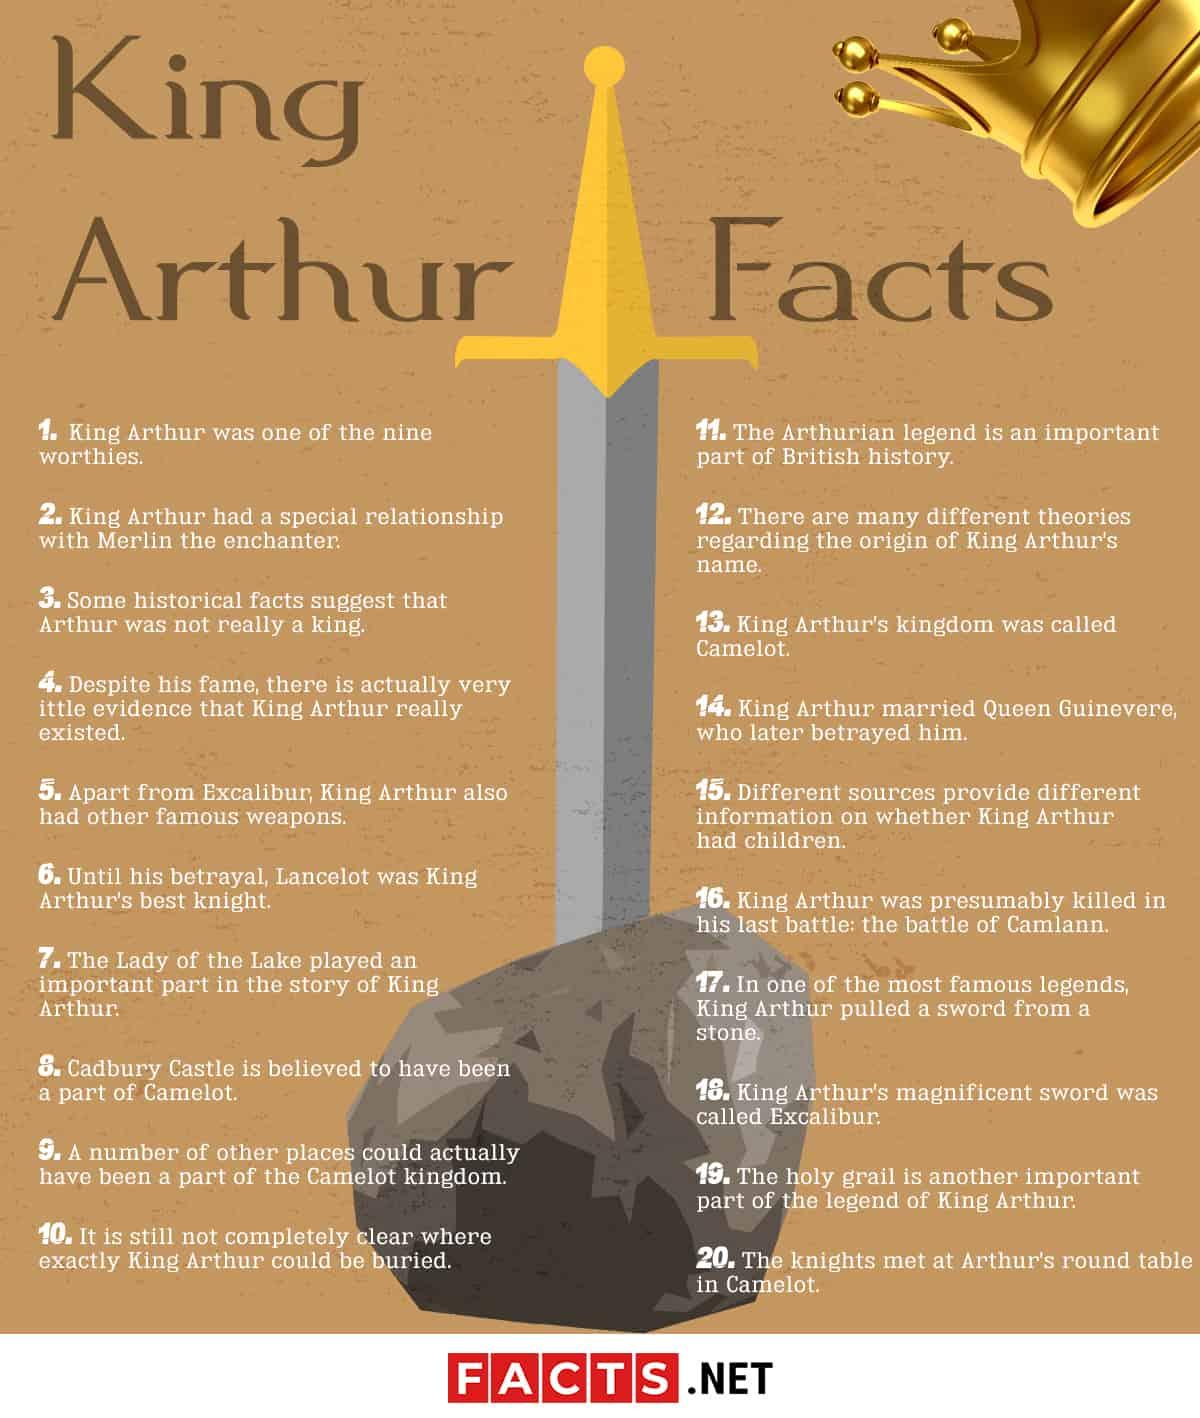 Top 20 King Arthur Facts